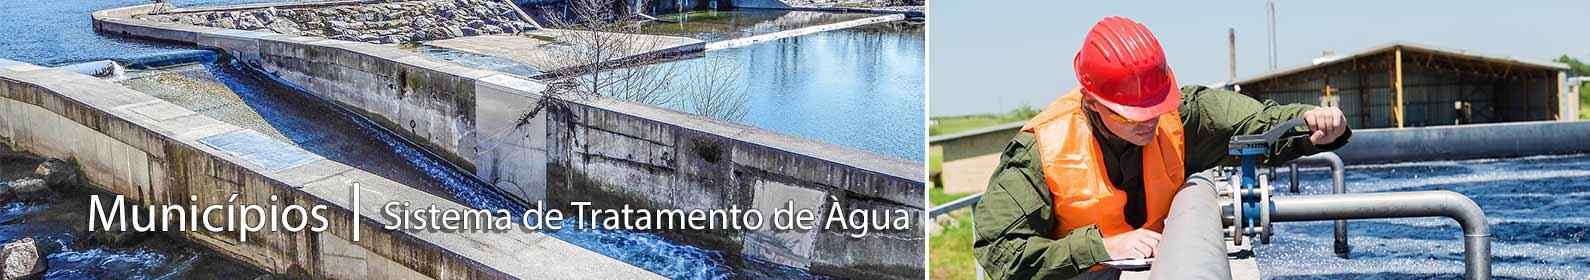 sistema-de-tratamento-de-gua-municipios..jpg